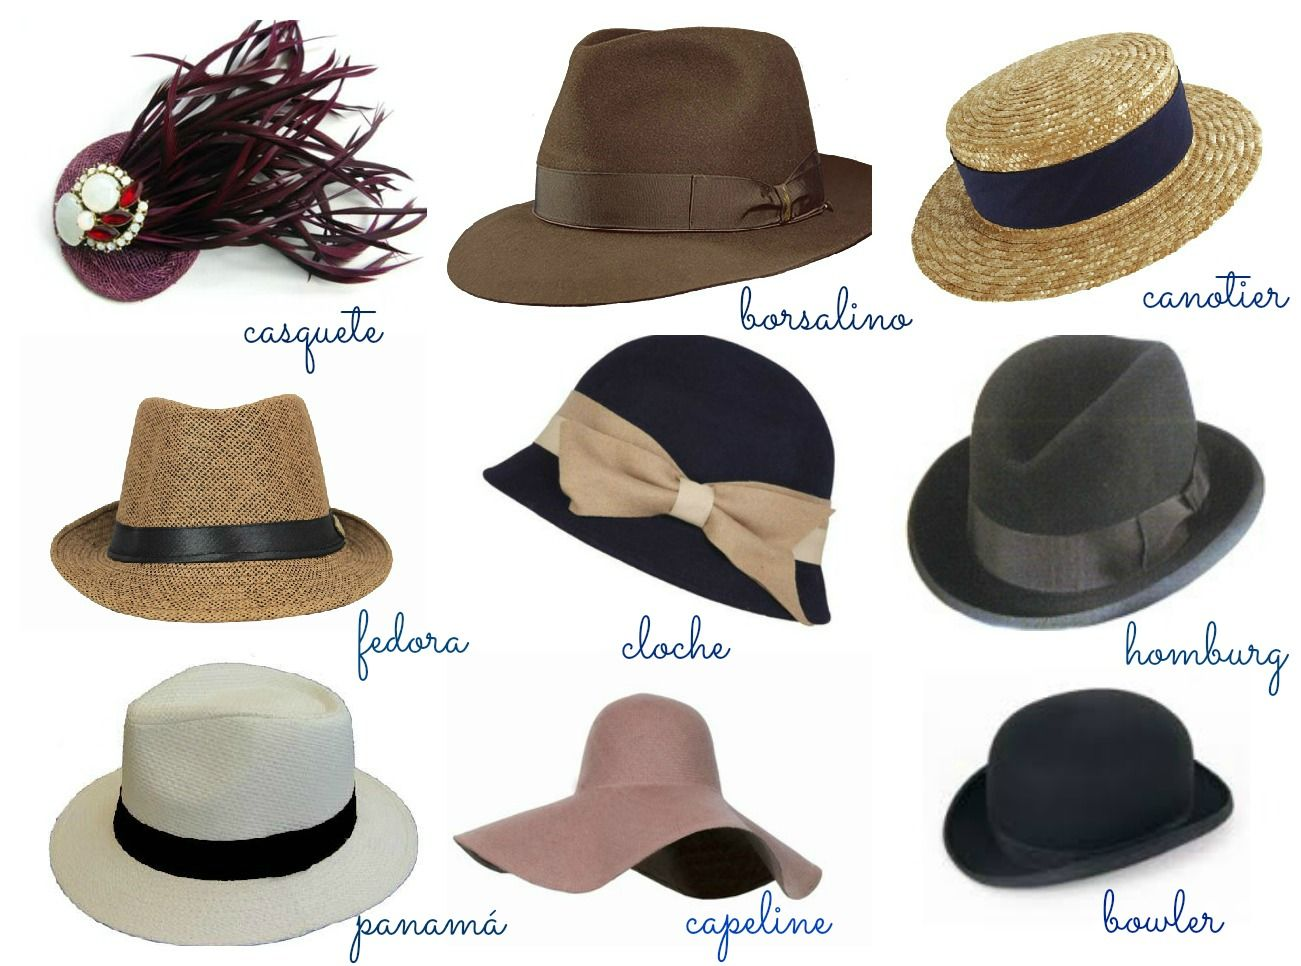 chapeus antigos femininos - Pesquisa Google  c1ed5b884df